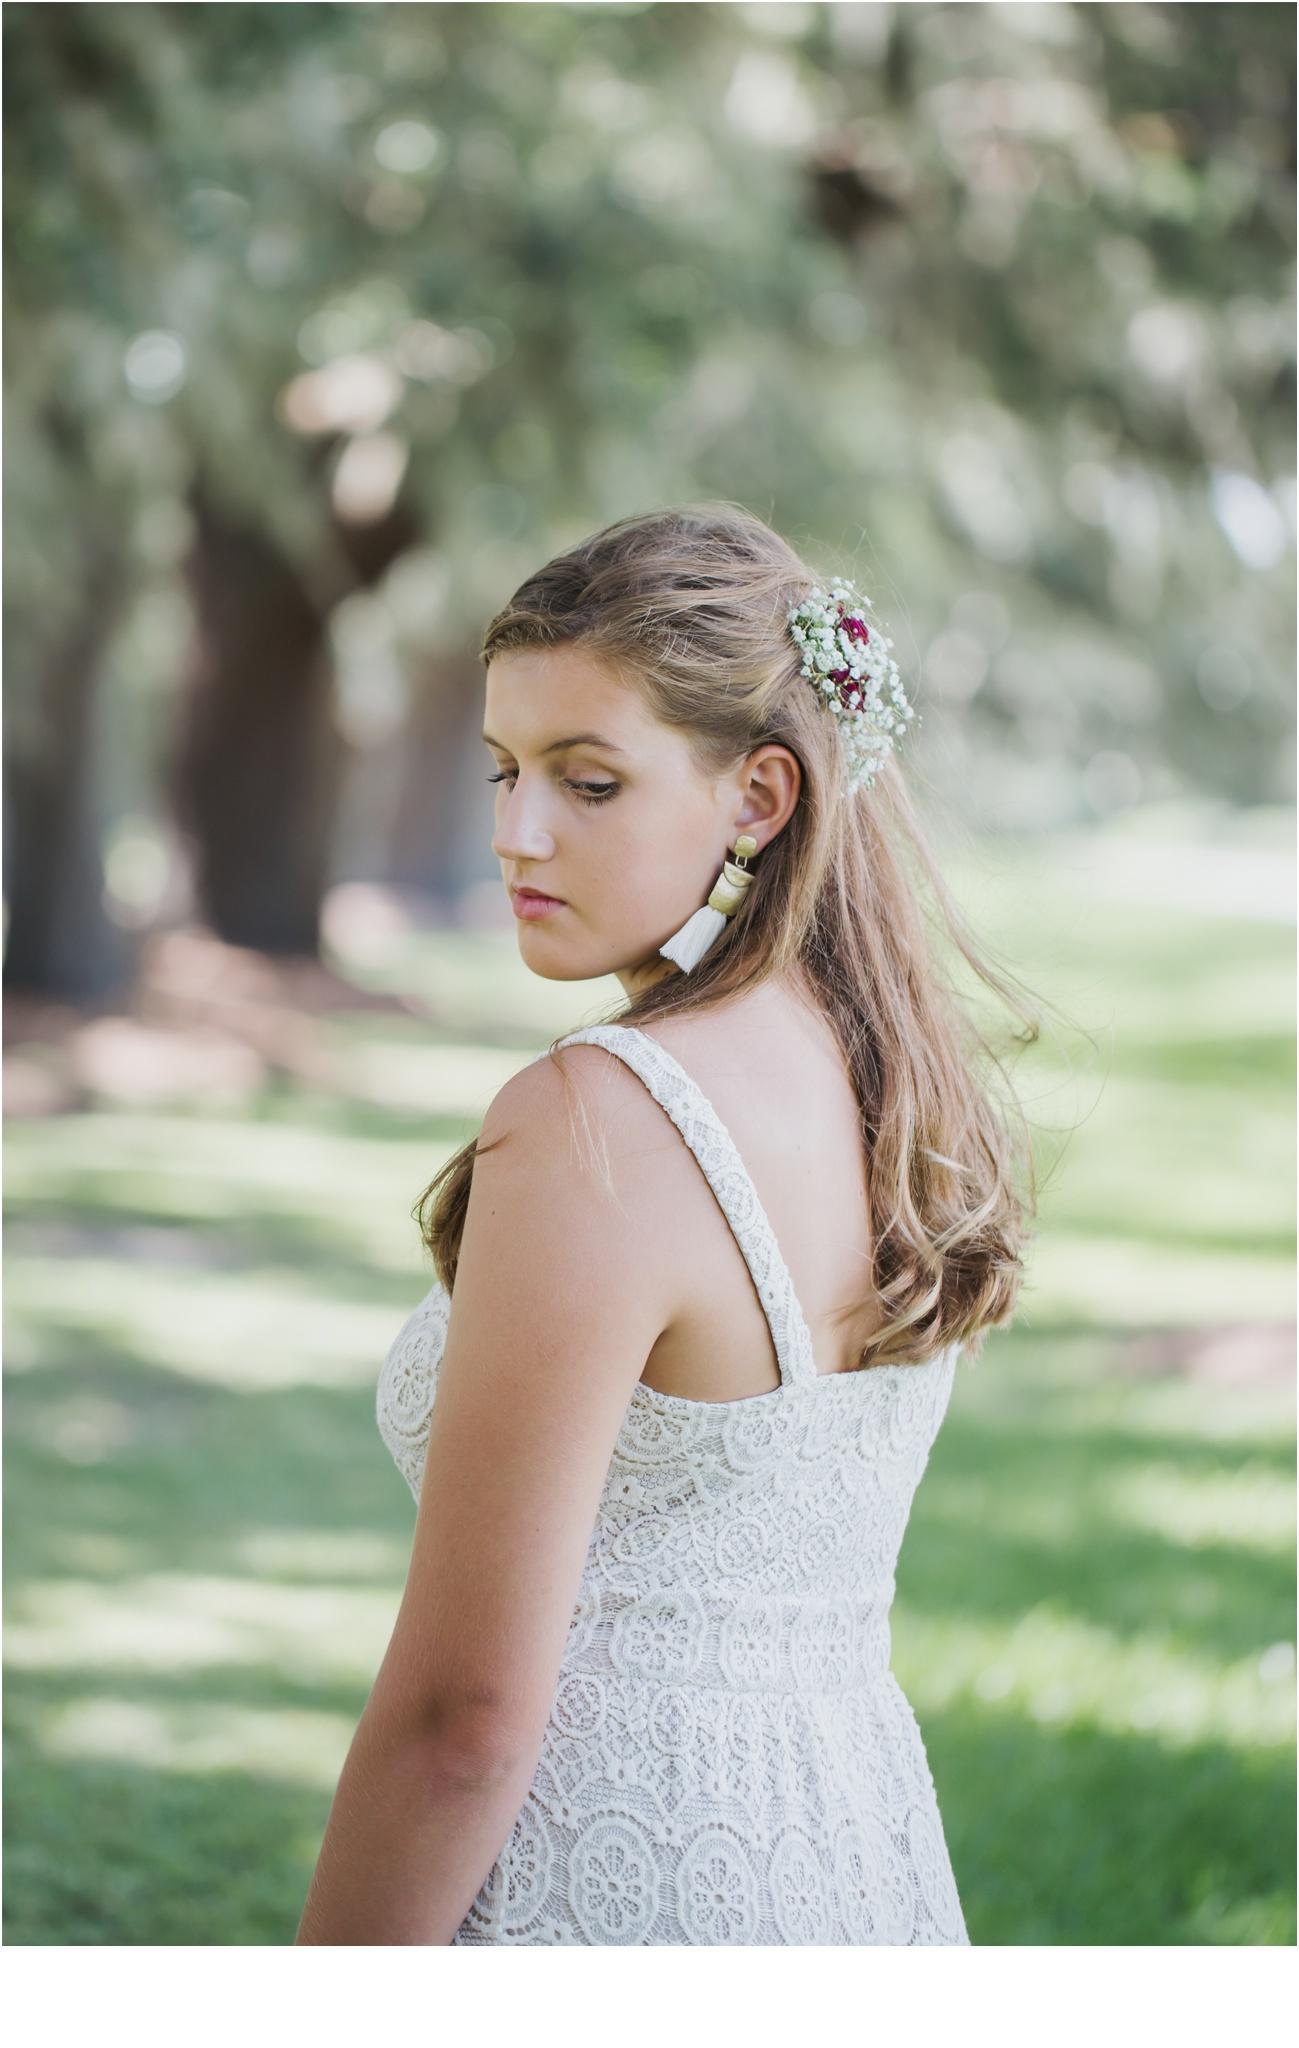 Rainey_Gregg_Photography_St._Simons_Island_Georgia_California_Wedding_Portrait_Photography_1109.jpg